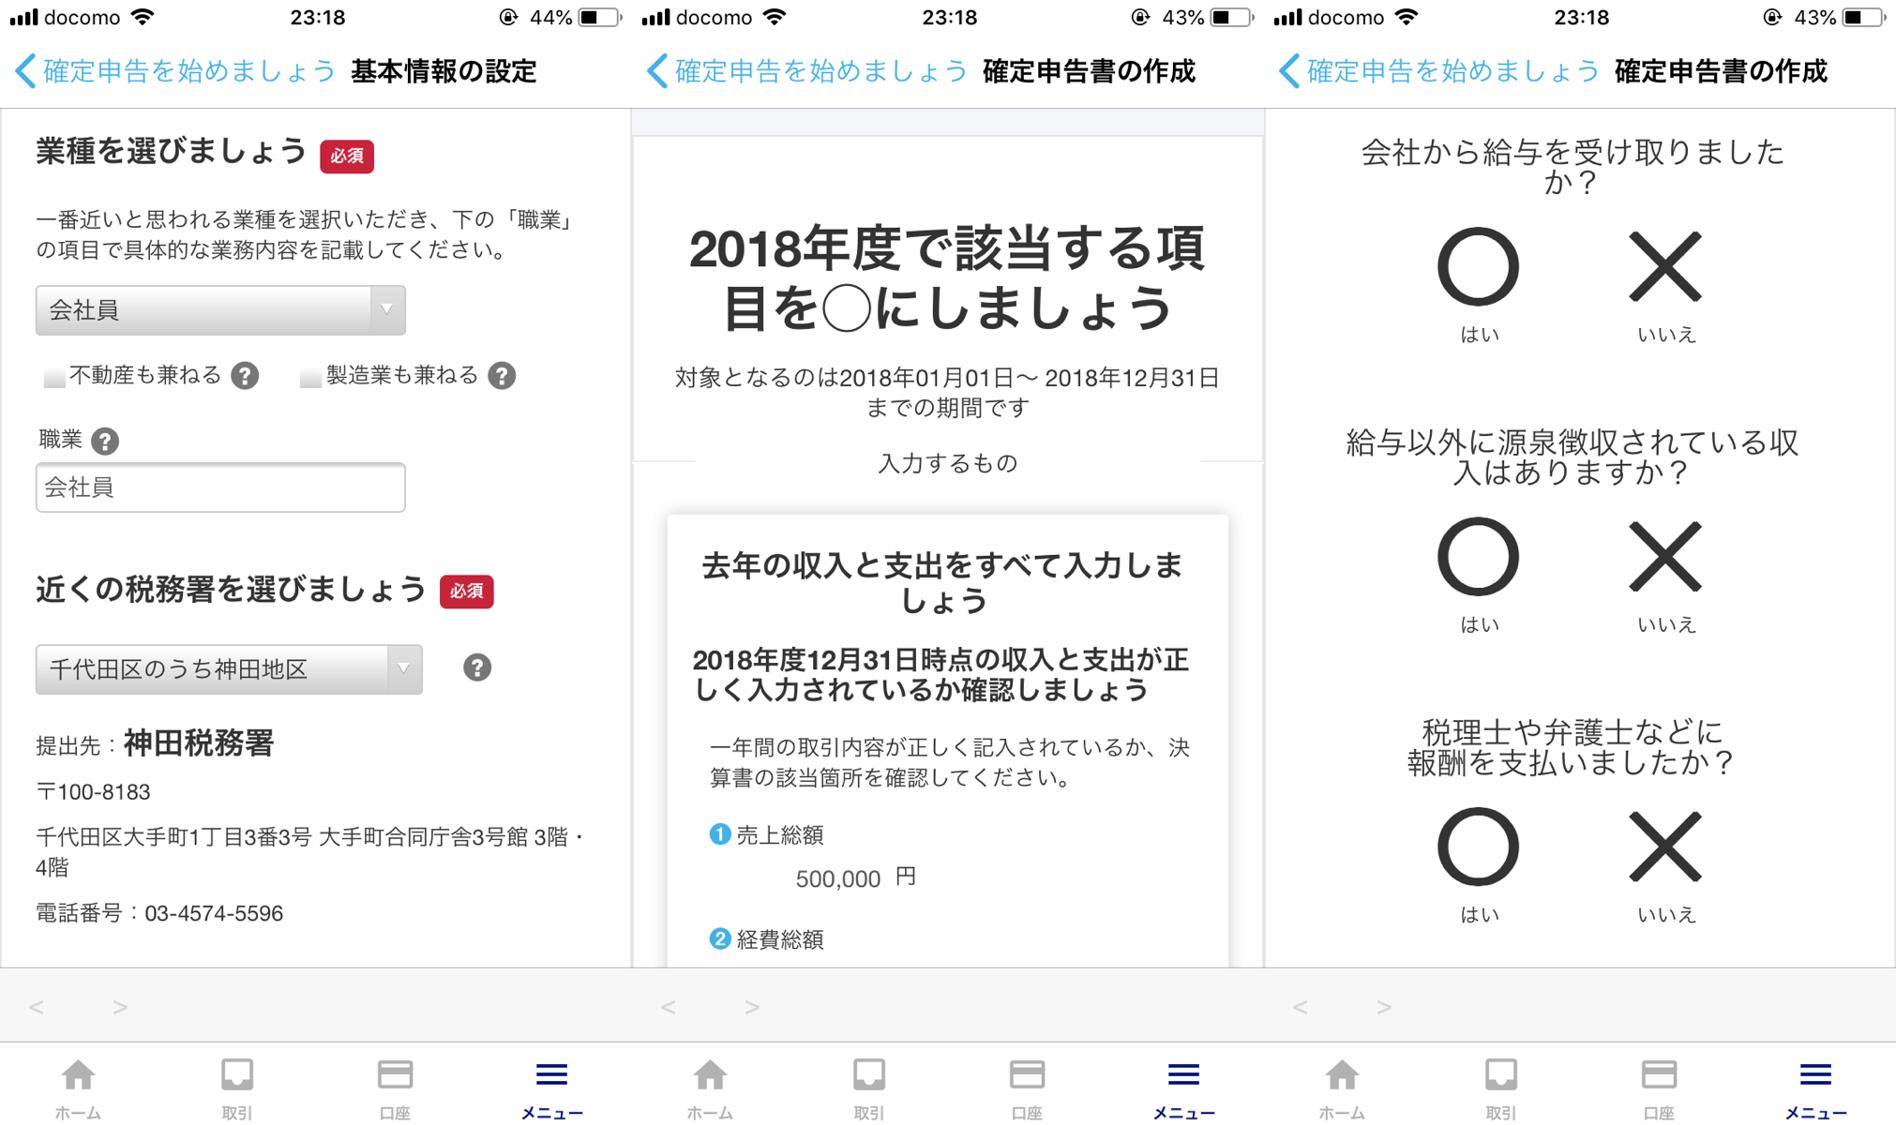 freeeのスマホアプリ確定申告機能